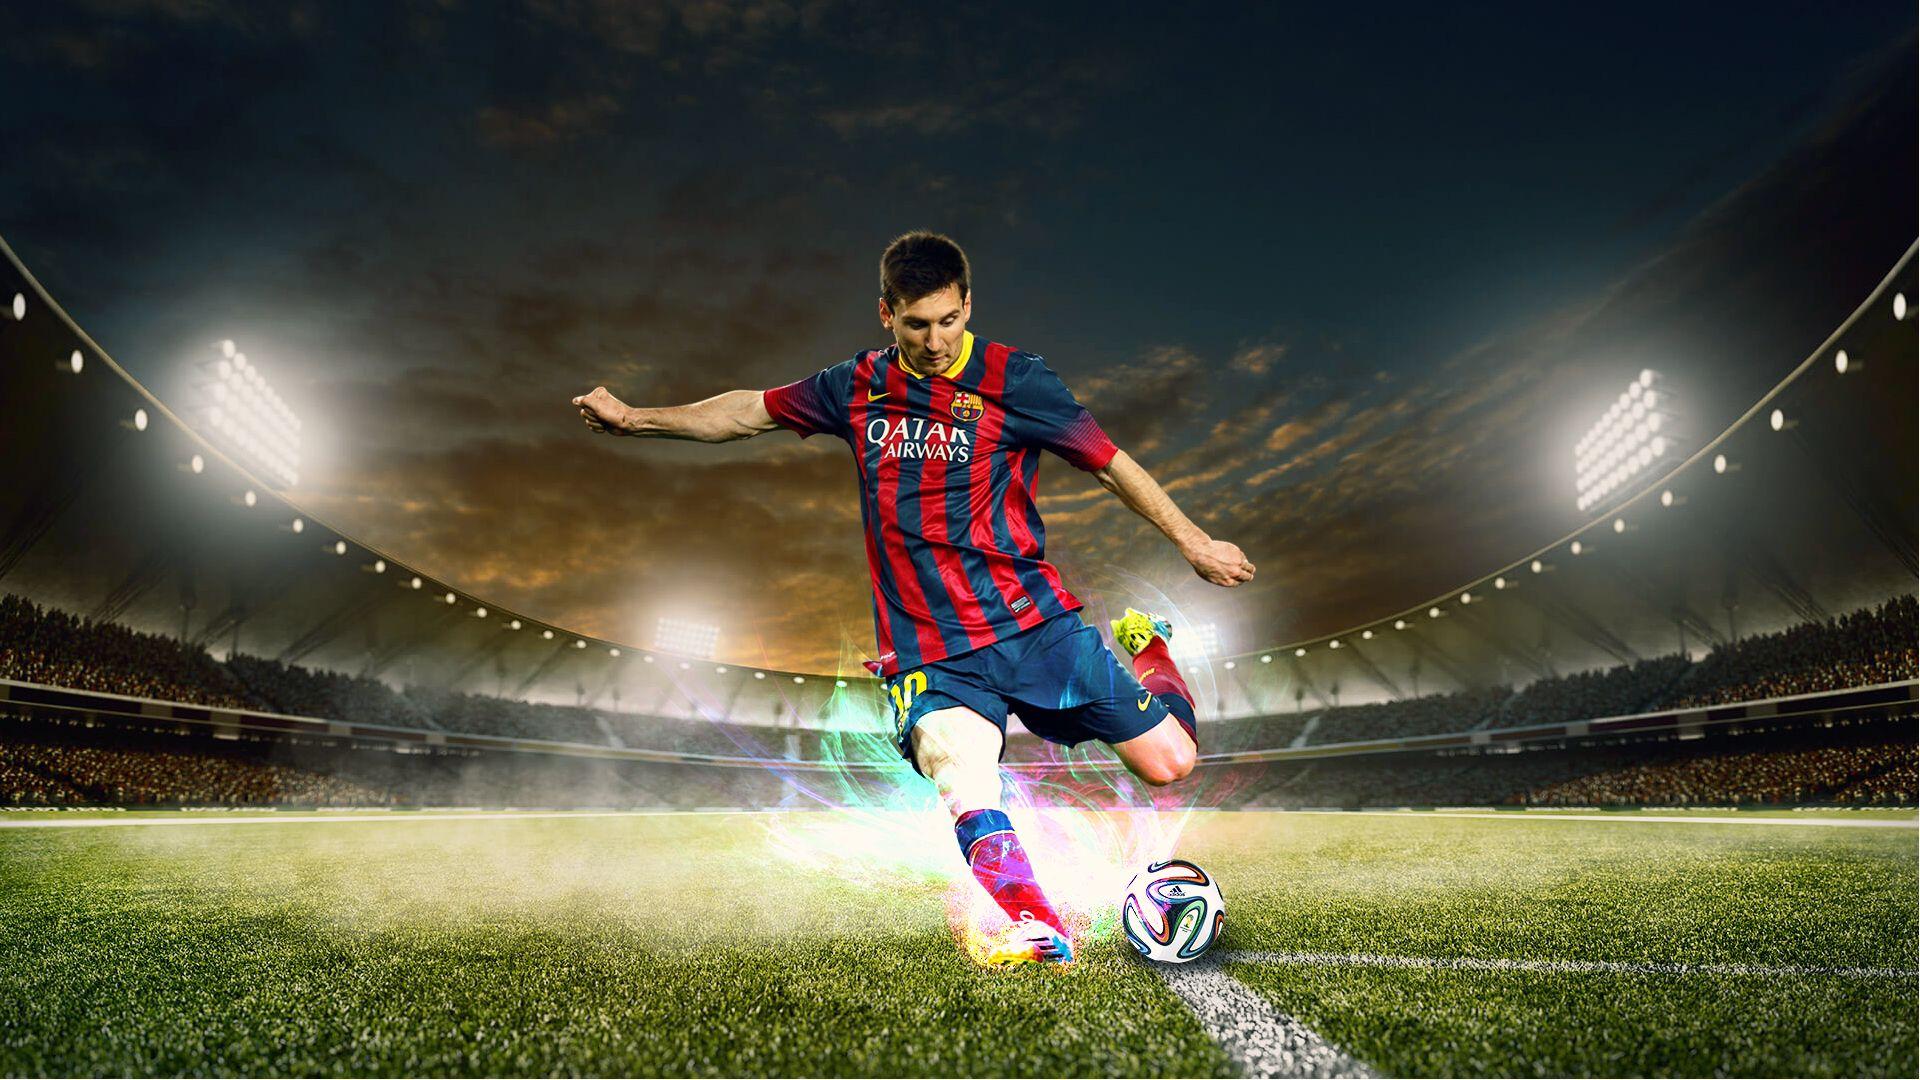 Football Backgrounds Wallpaper มวยไทย, ฟุตบอล, อังกฤษ